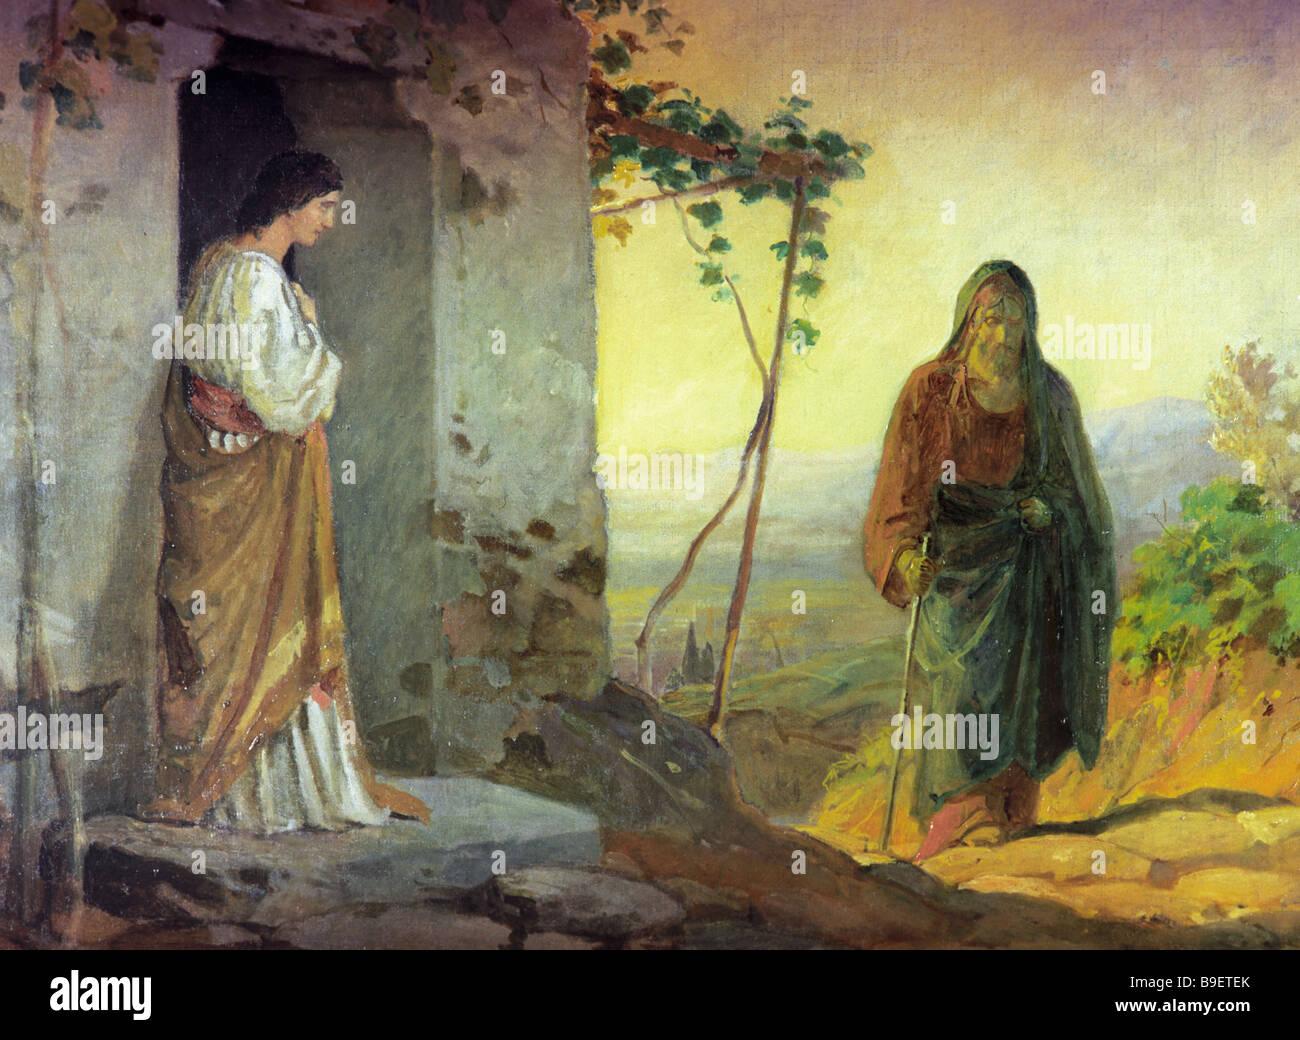 Lazarus jesus stock photos lazarus jesus stock images for Jesus brings lazarus back to life coloring page